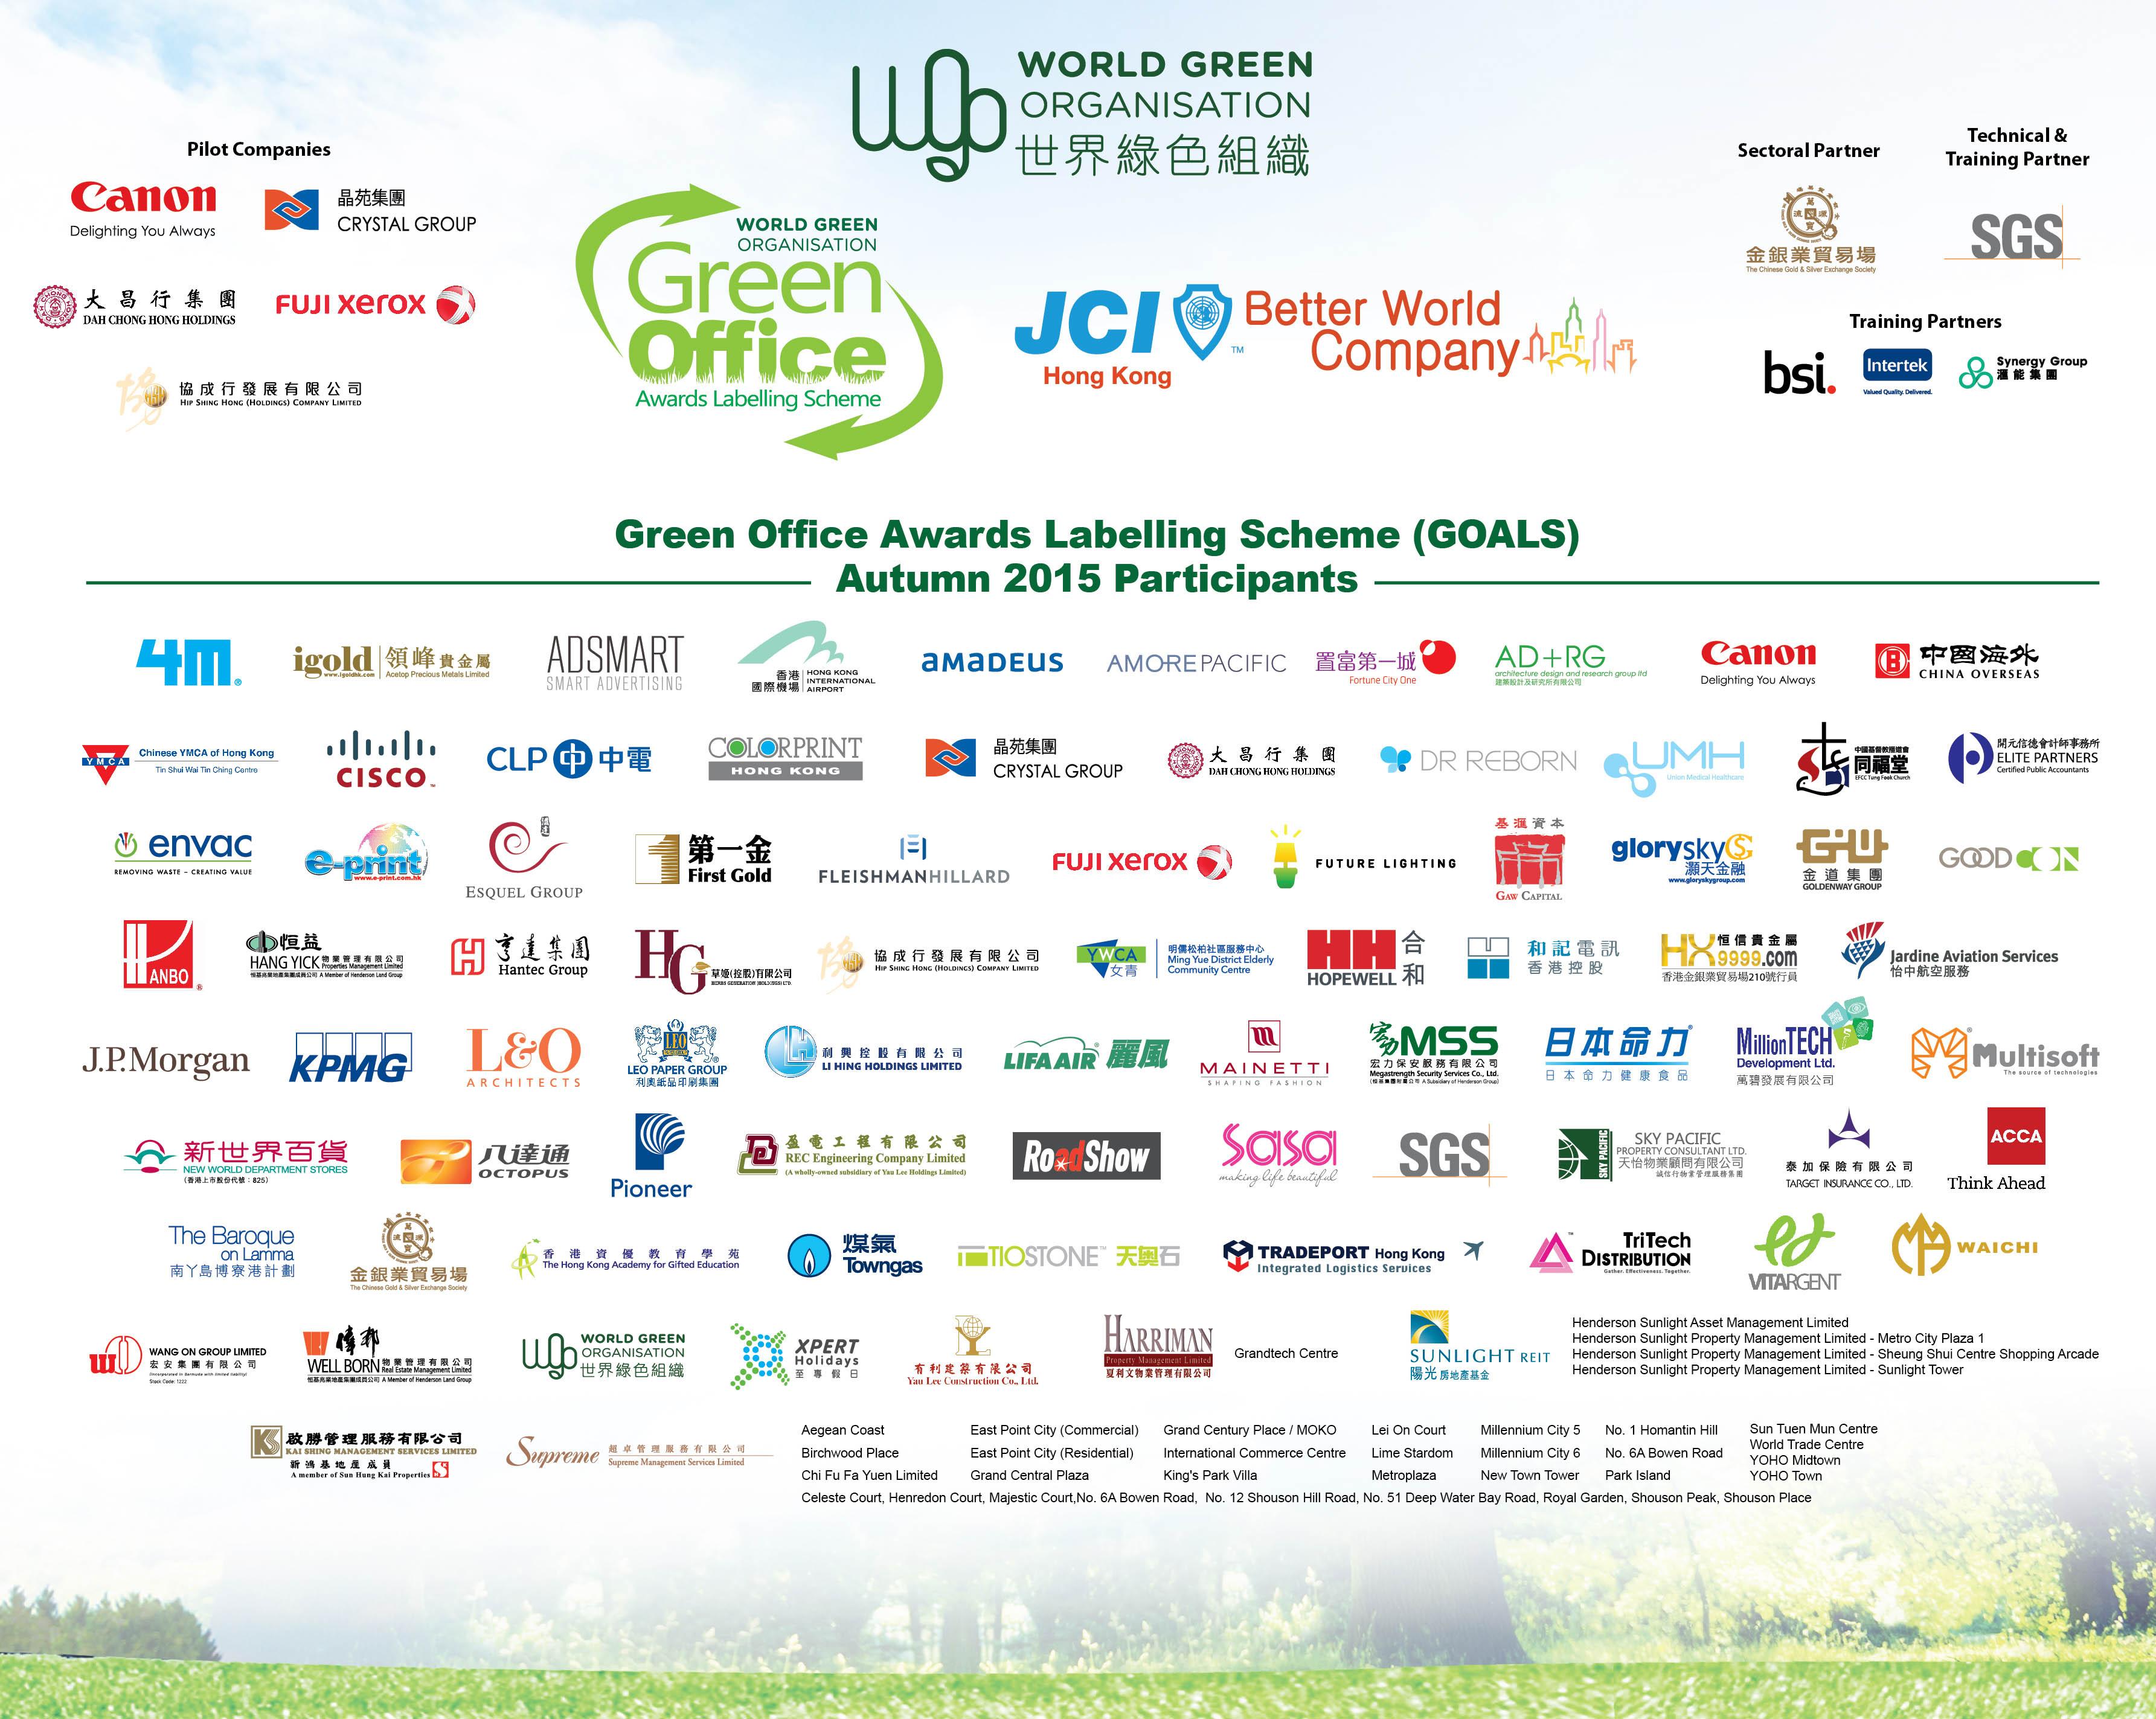 WGO Green Office 2015 awardees company list